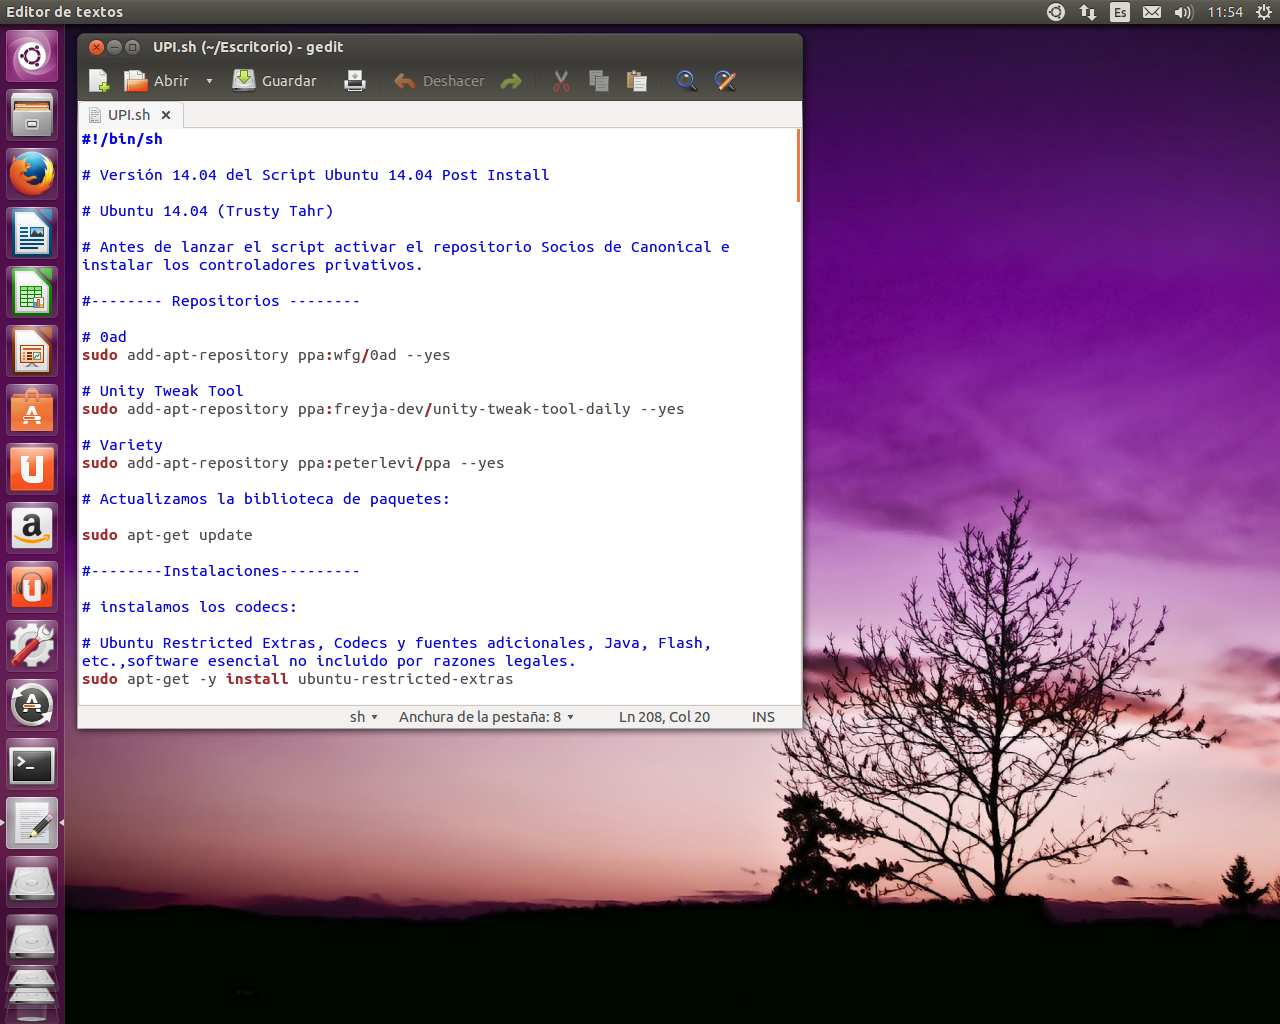 Script Ubuntu 14.04 Post Install